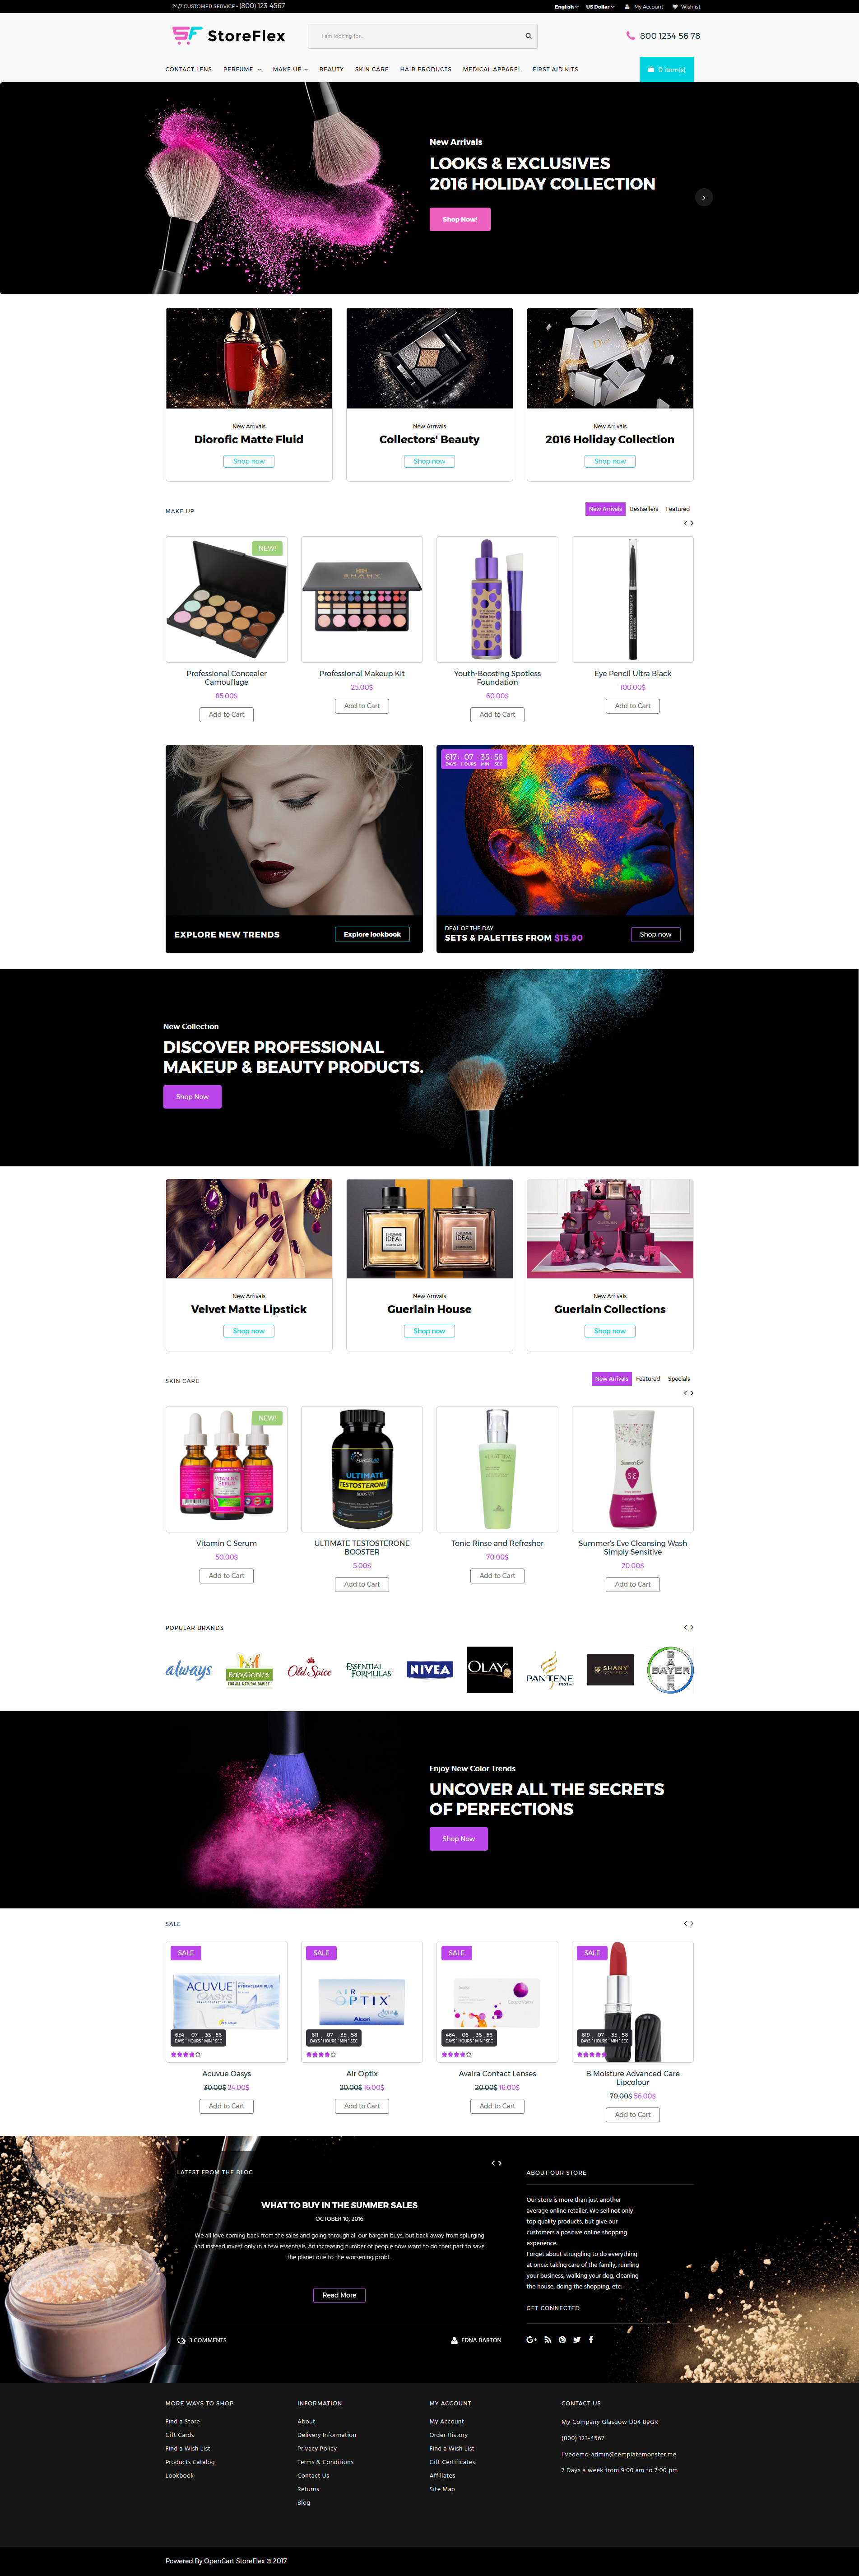 Responsive StoreFlex - Cosmetics Store Responsive Opencart #63354 - Ekran resmi